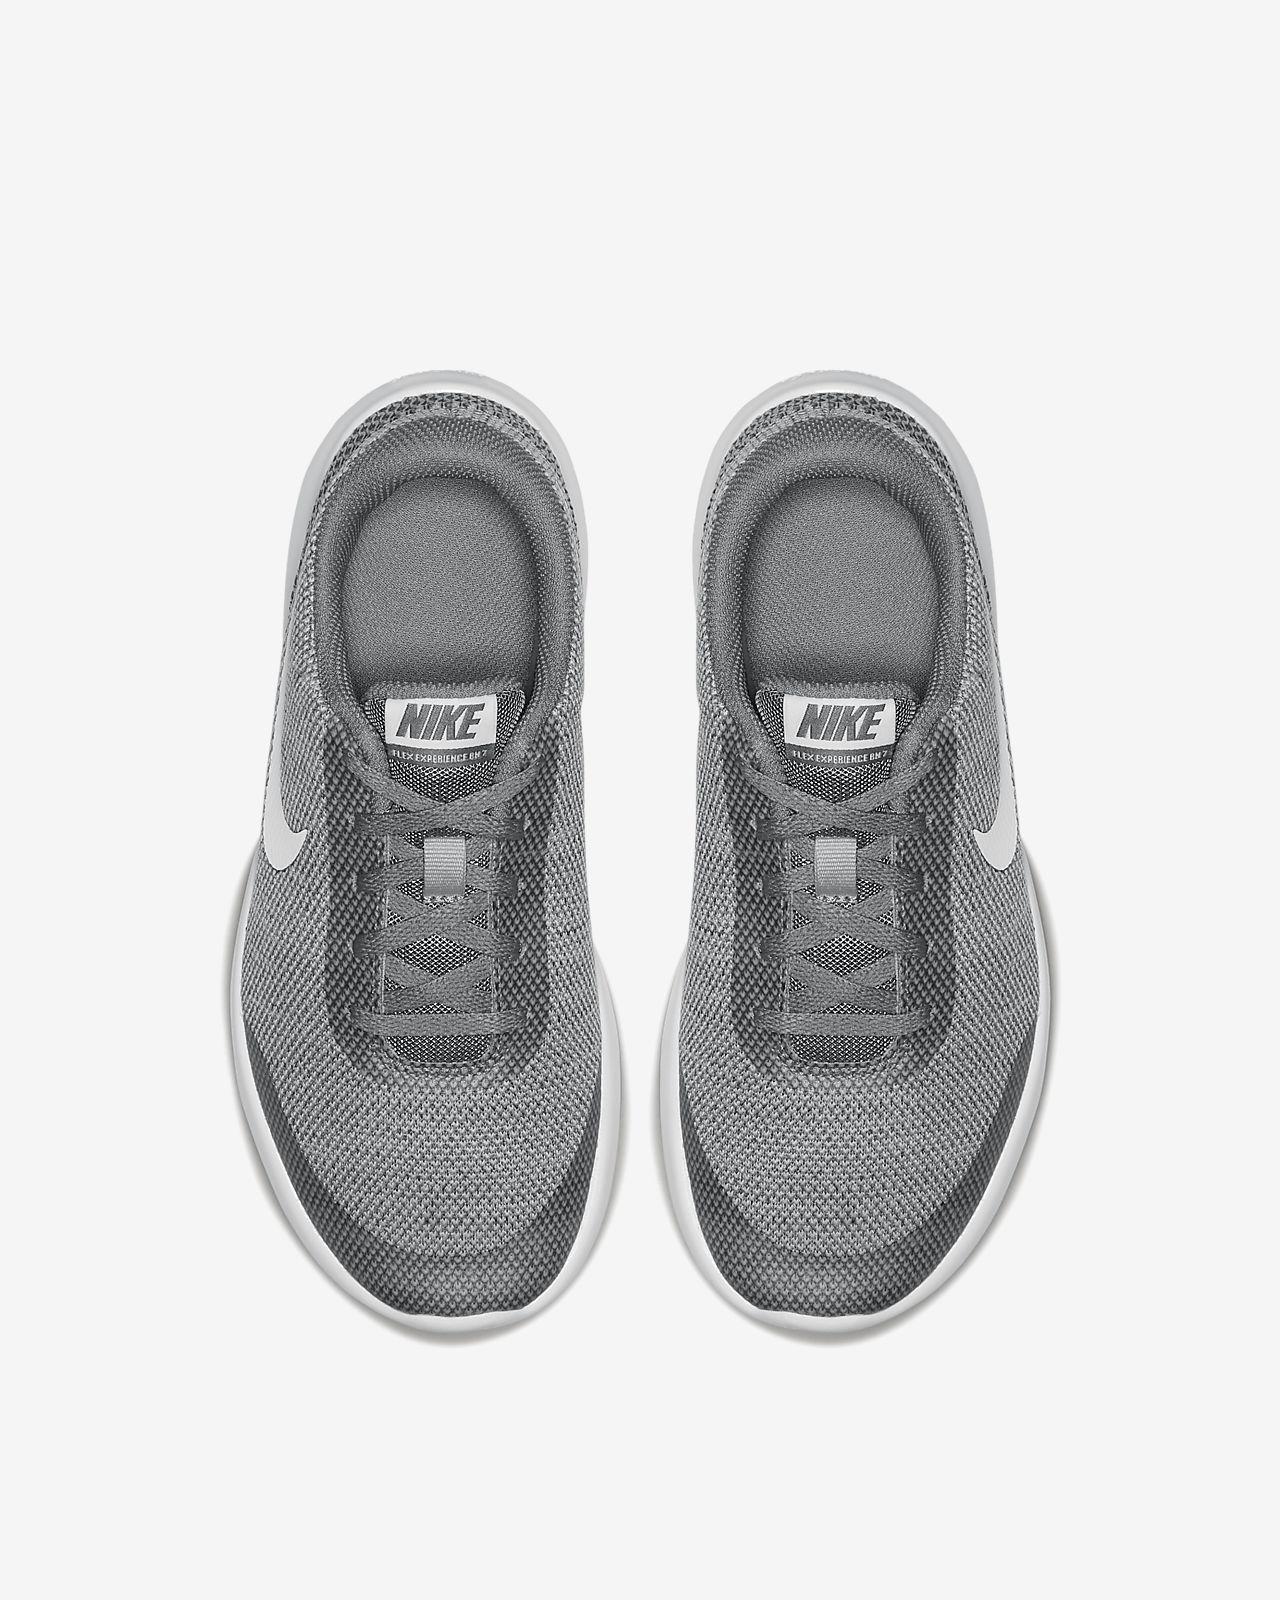 8d7fd80b60e25 Nike Flex Experience Run 7 Zapatillas de running - Niño a. Nike.com ES